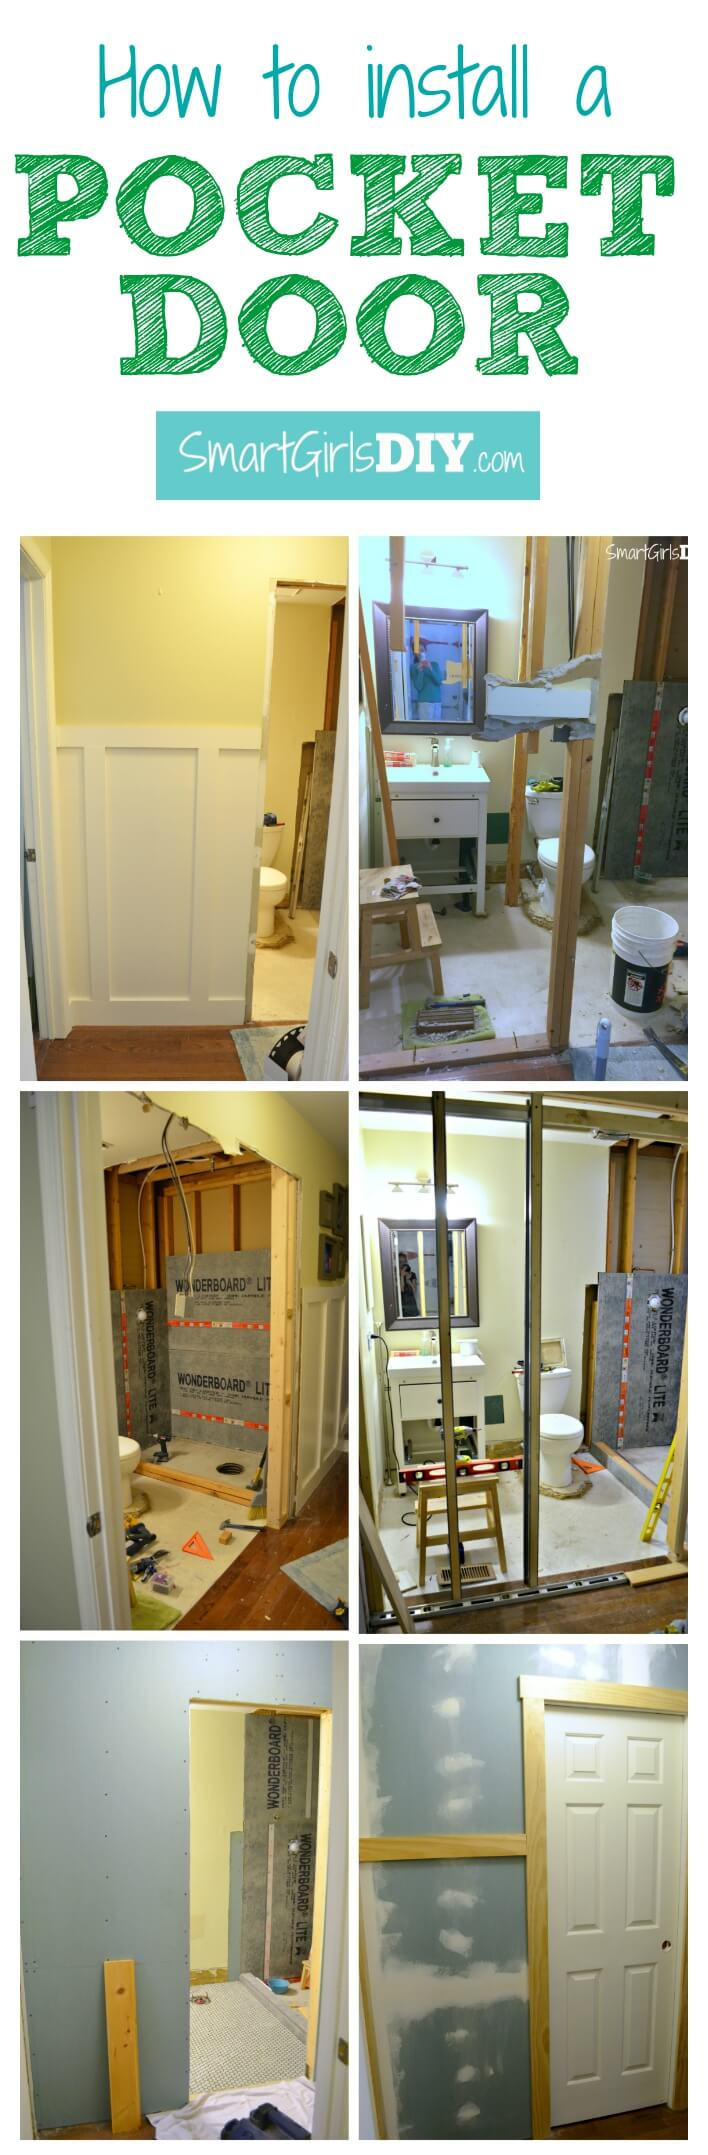 Building A Pocket Door : How to install a pocket door johnson hardware series